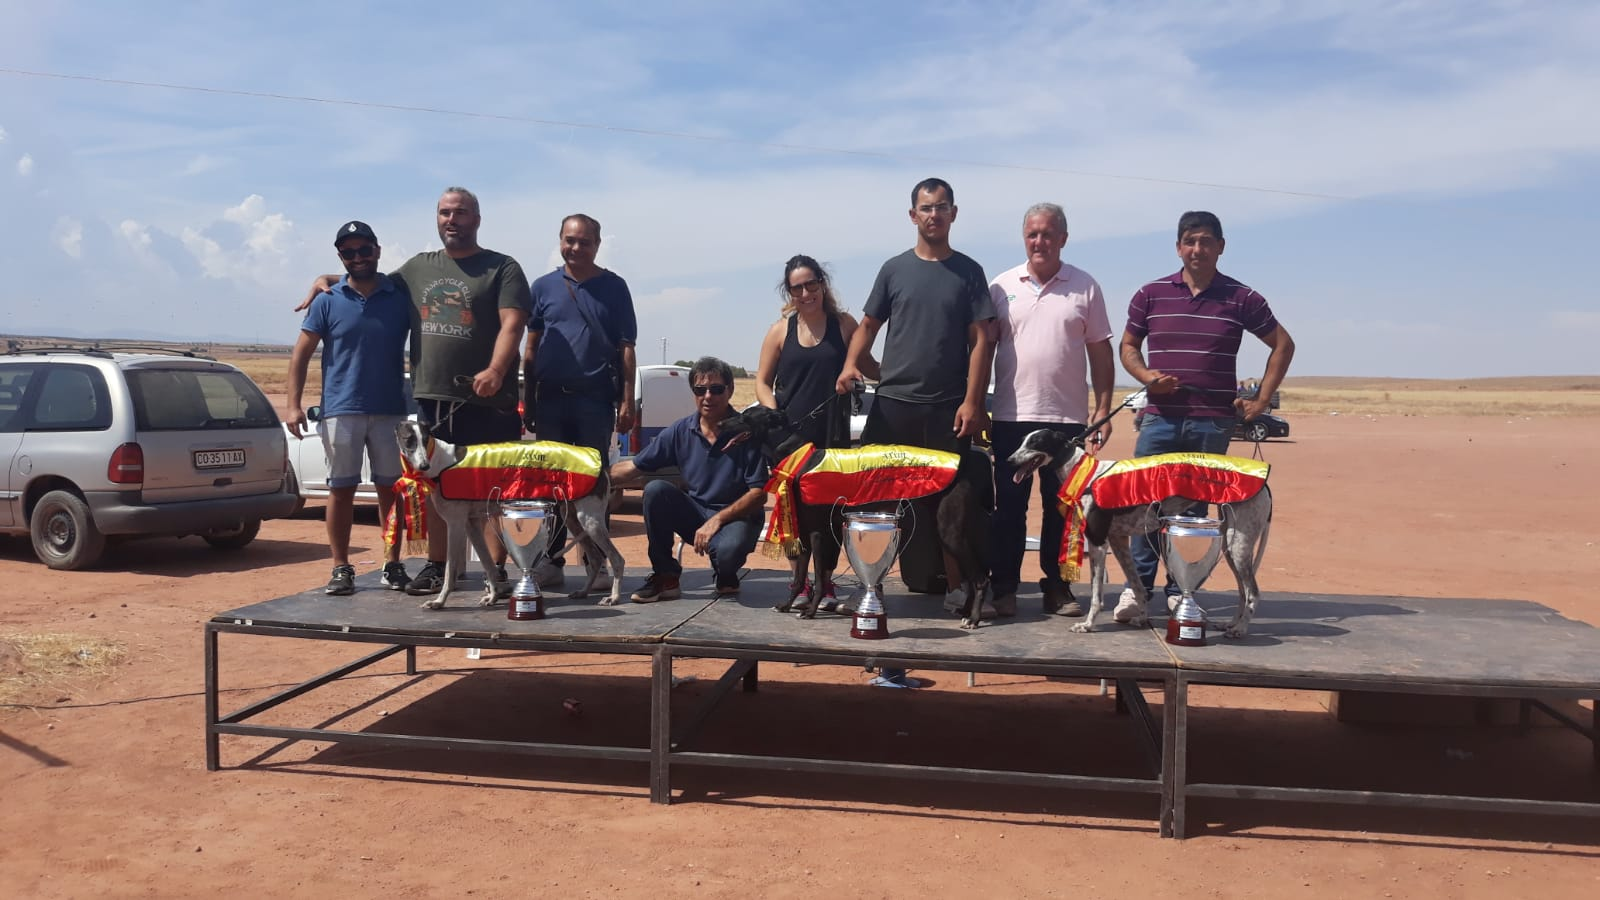 Palmarés del XXXIII Campeonato de España de Galgos en Campo con Liebre Mecánica